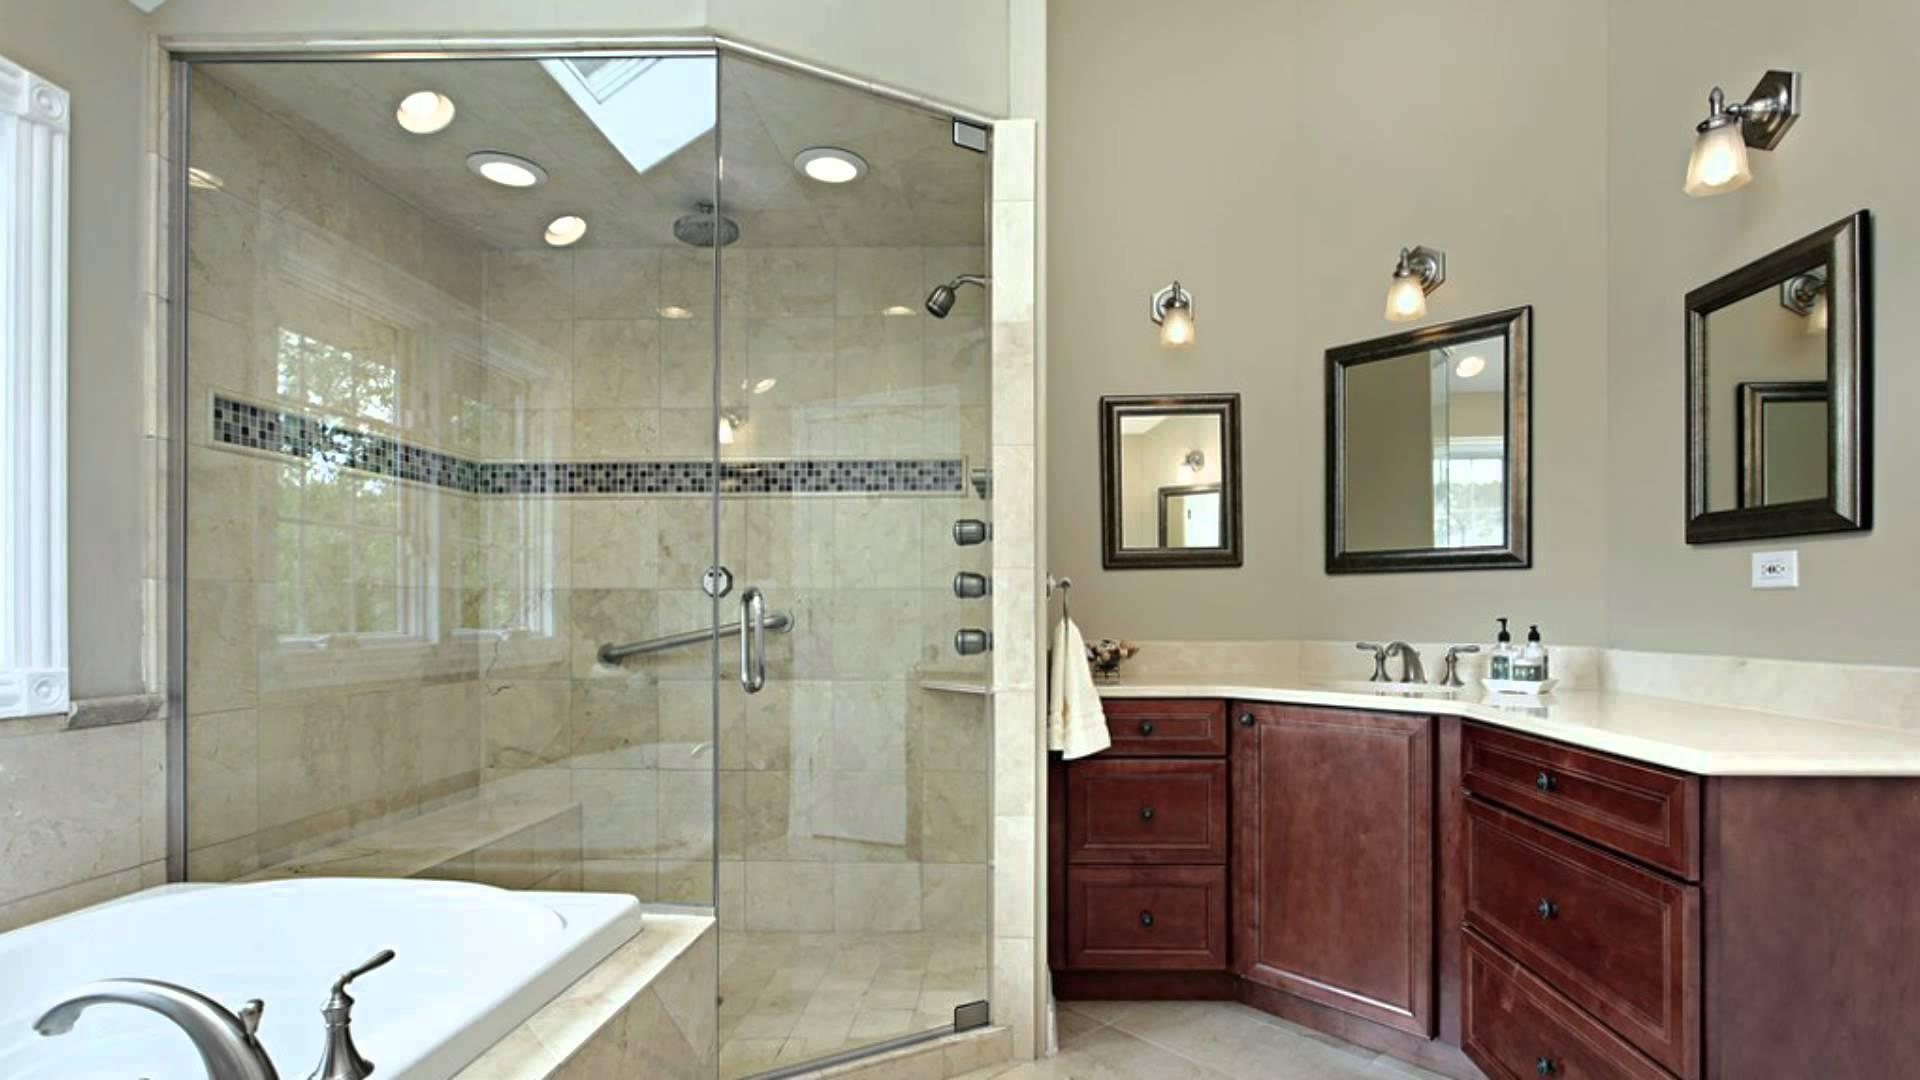 30 Beautiful Bathrooms Dream Bathrooms Blog